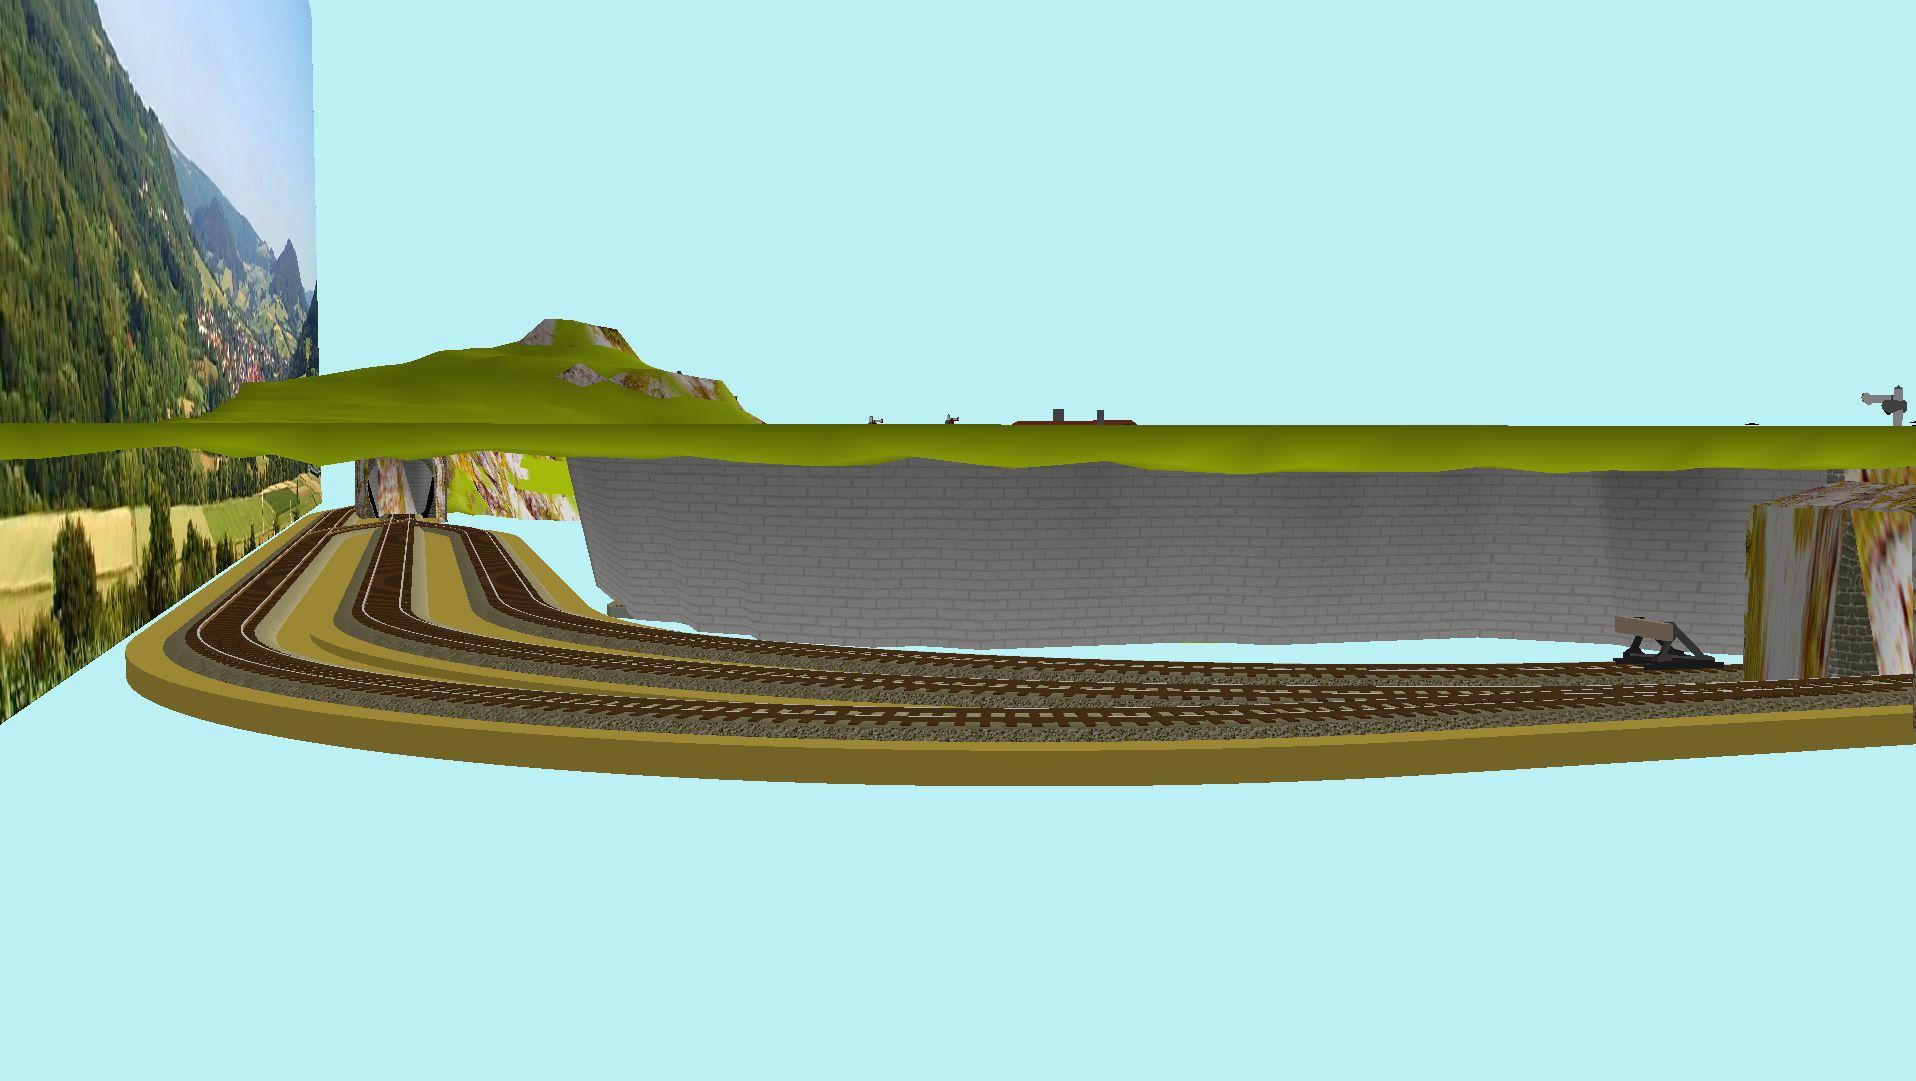 'ALBA Modellbahnpraxis' Band 1, Plan 5 Amp-1_5_k-gleis_sb_00ikdw